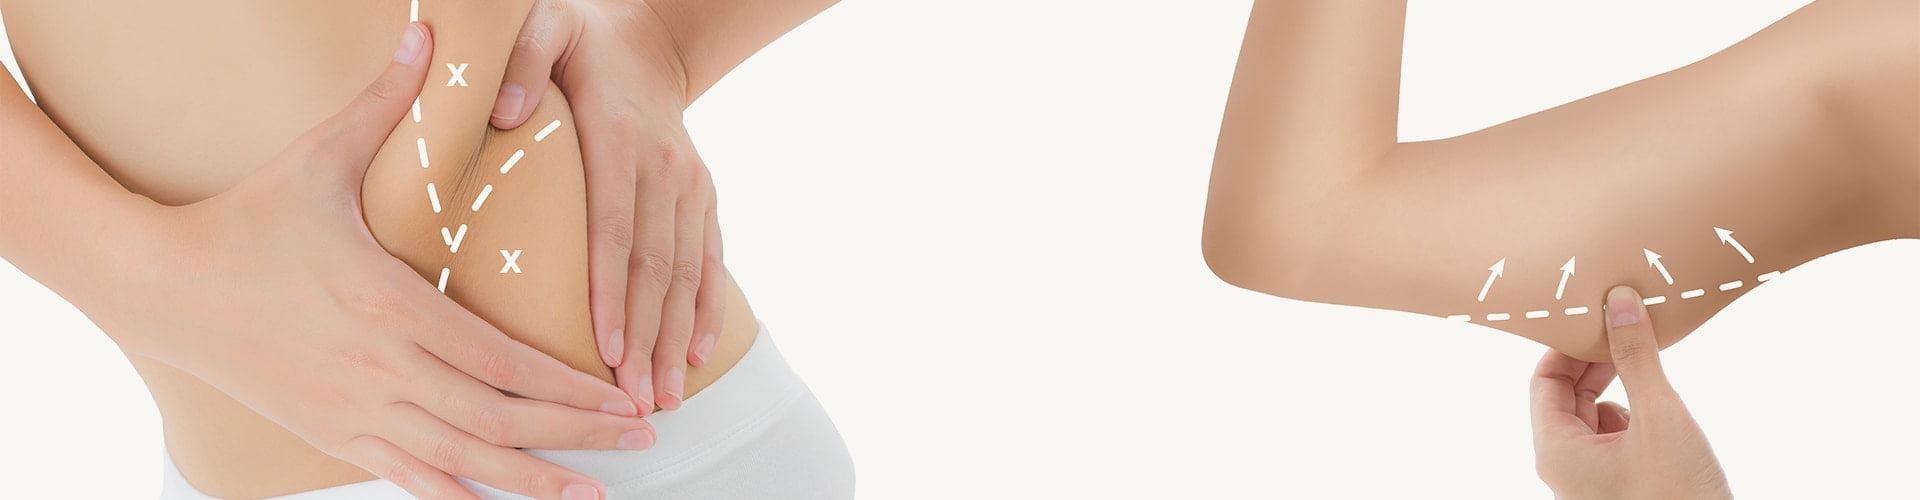 liposuction operasyonu